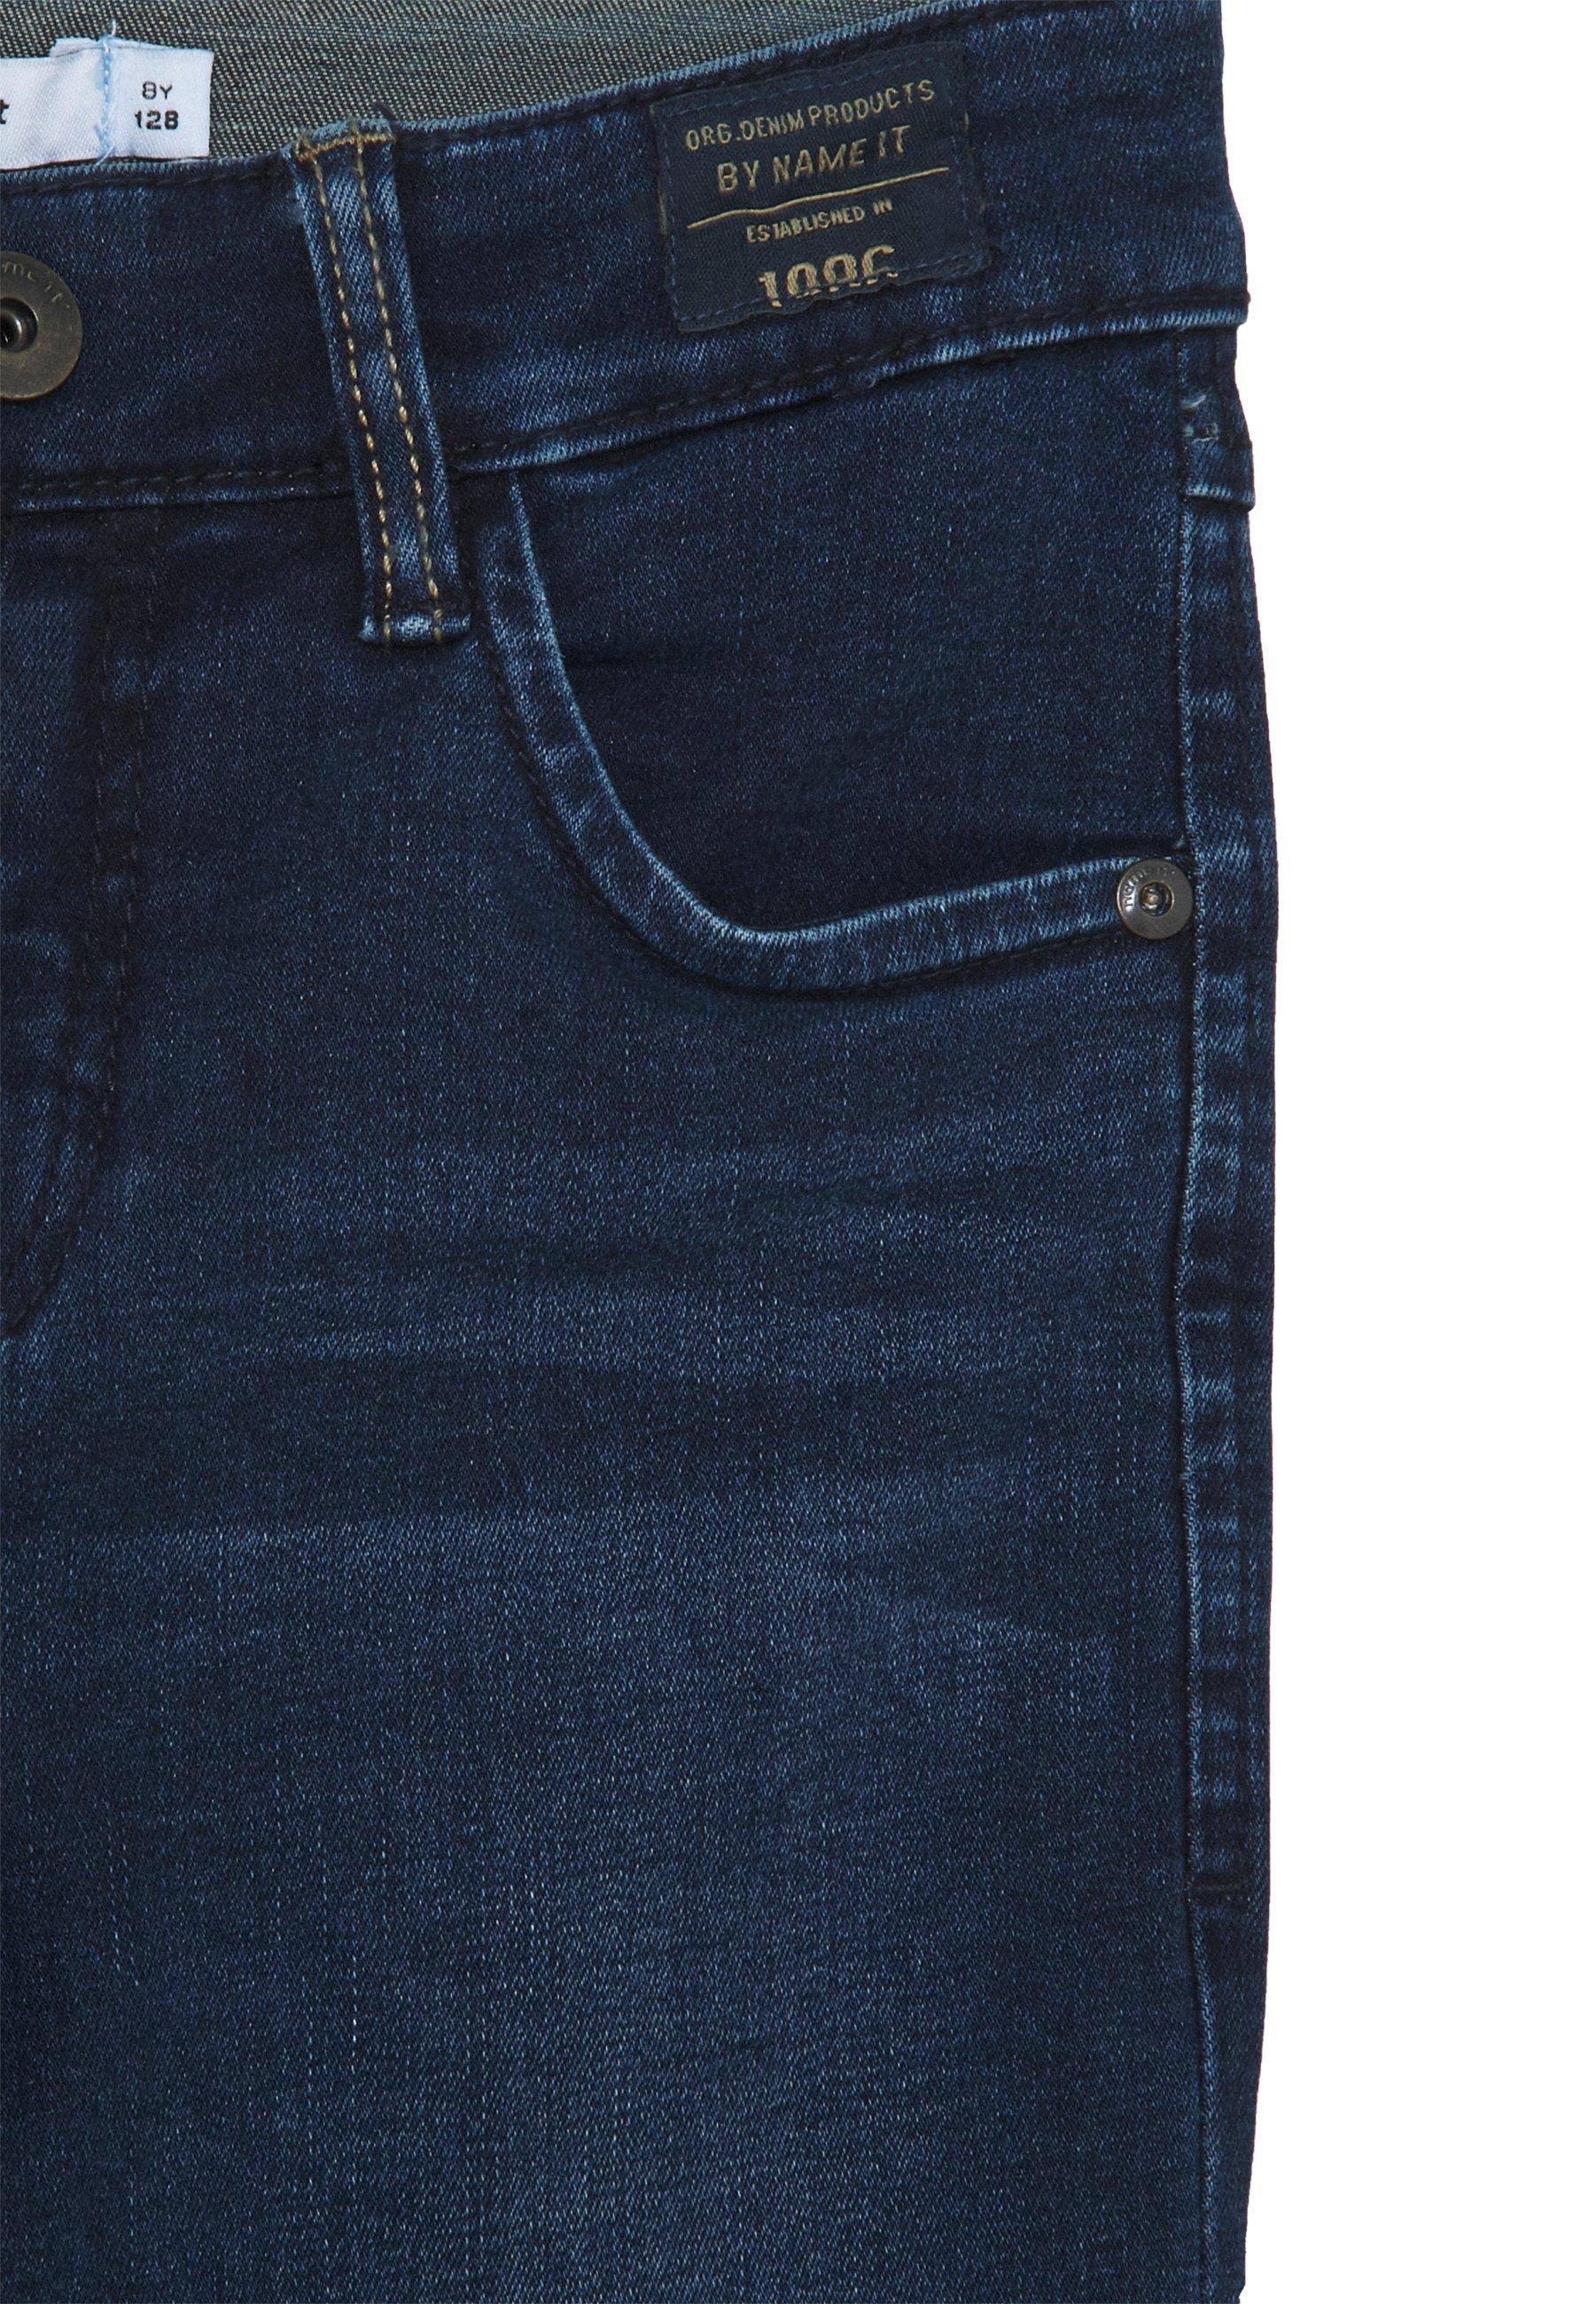 NKMSILAS TOGO 86 PANT Jeans Straight Leg dark blue denim